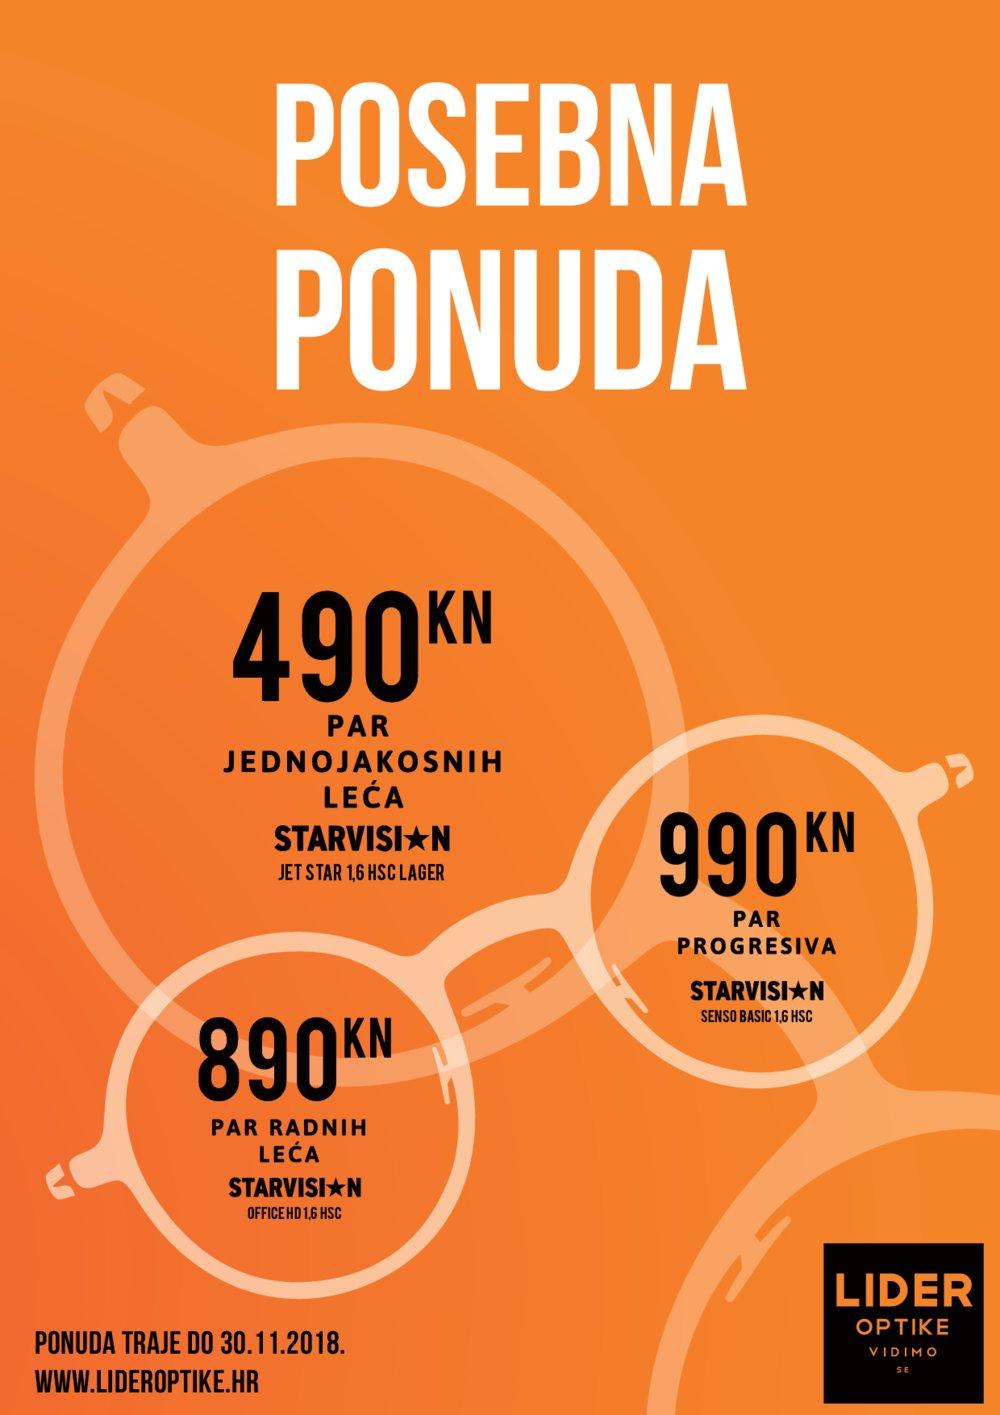 Lider Optika letak Posebna ponuda 31.10.-31.12.2018.